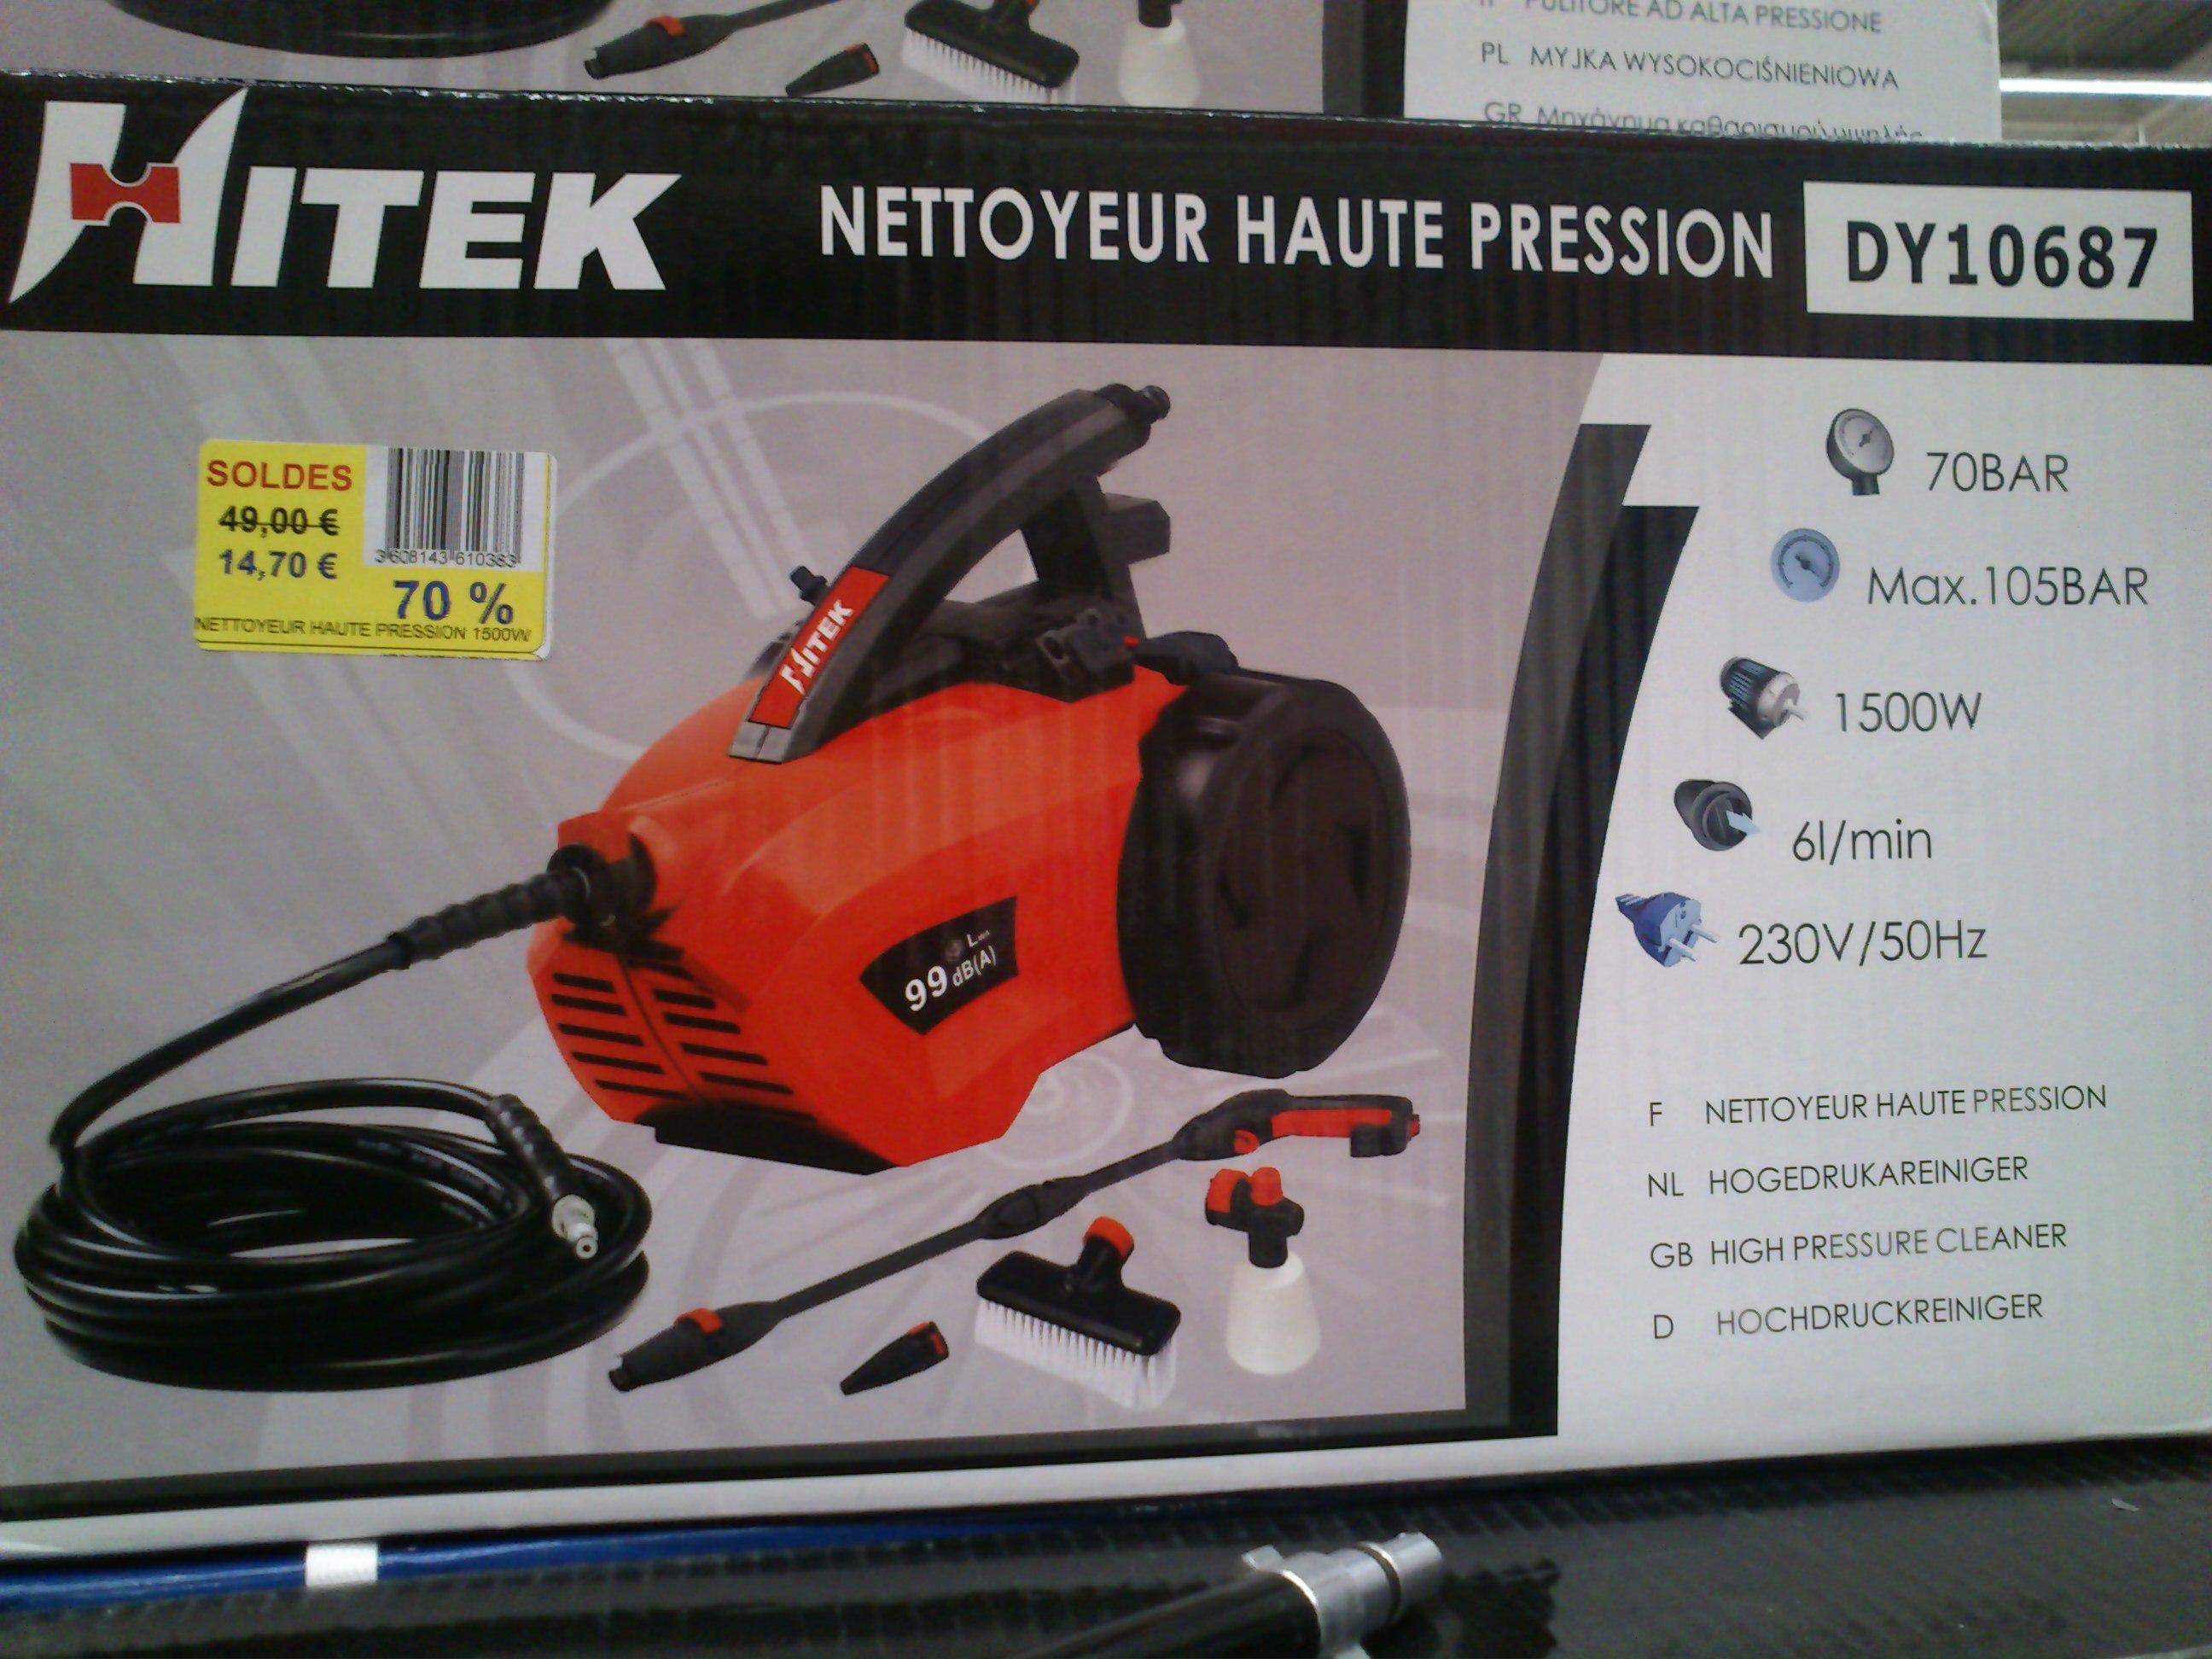 Nettoyeur haute pression hitek 105 bars - Carrefour nettoyeur haute pression ...